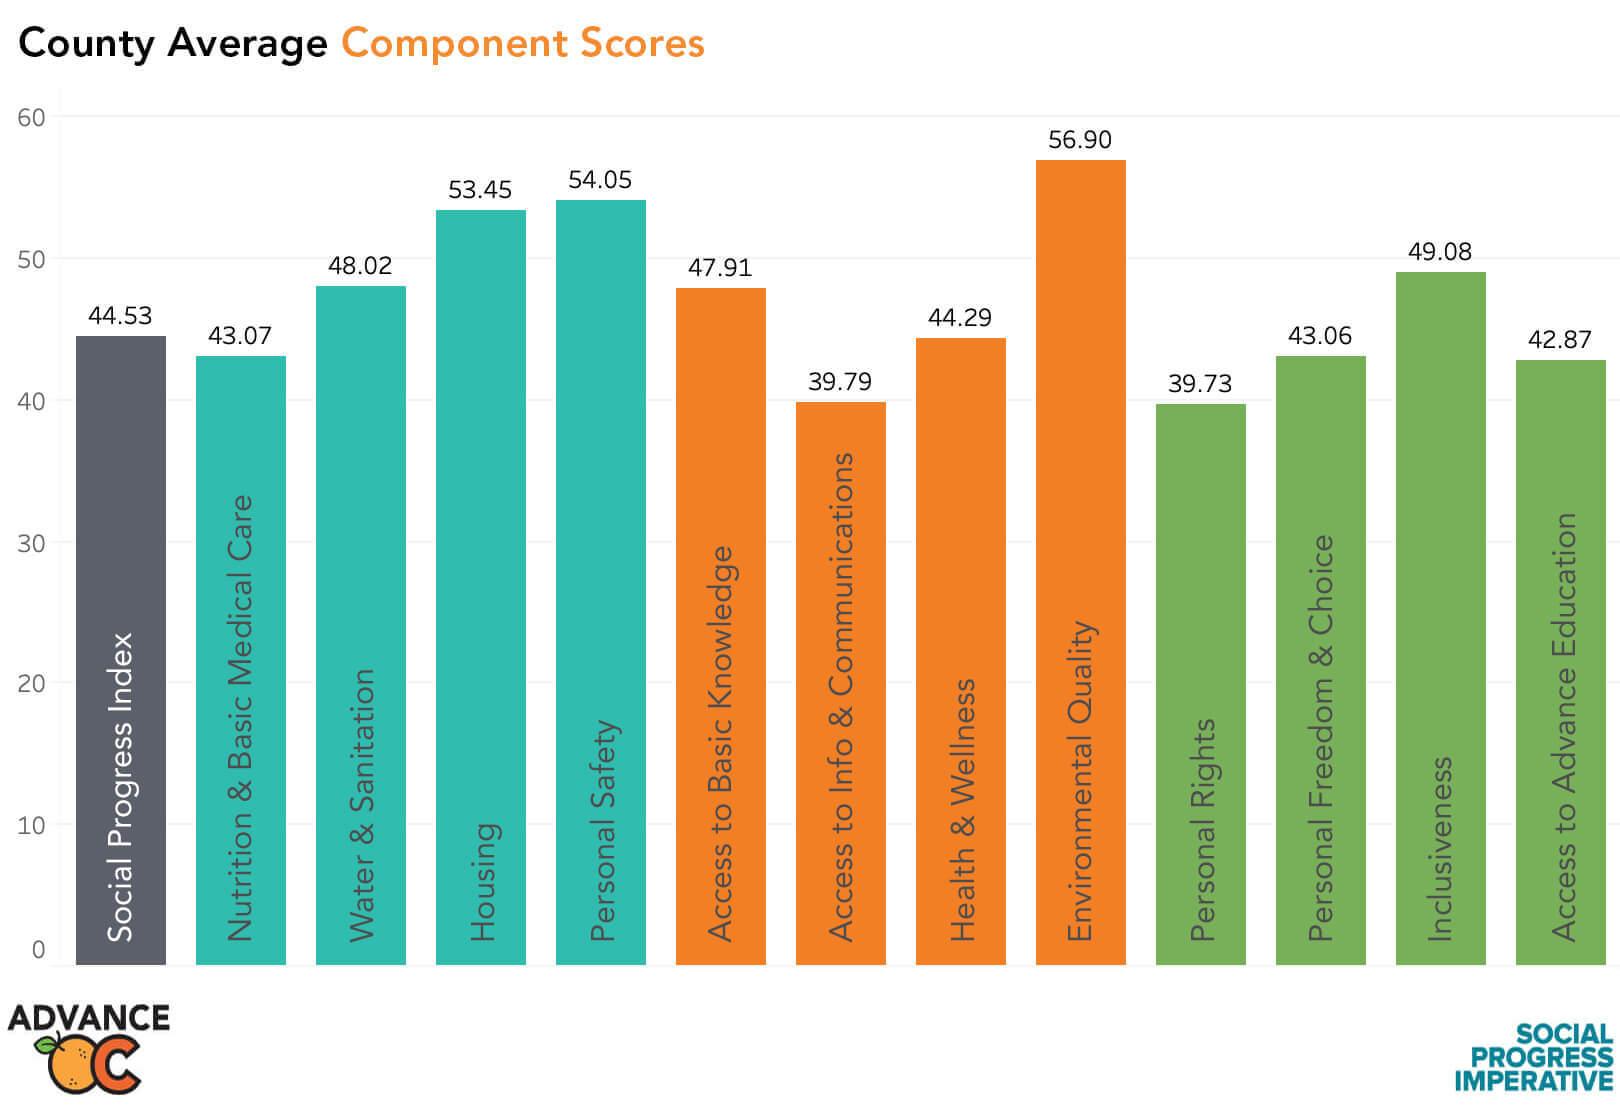 County Average Component Scores